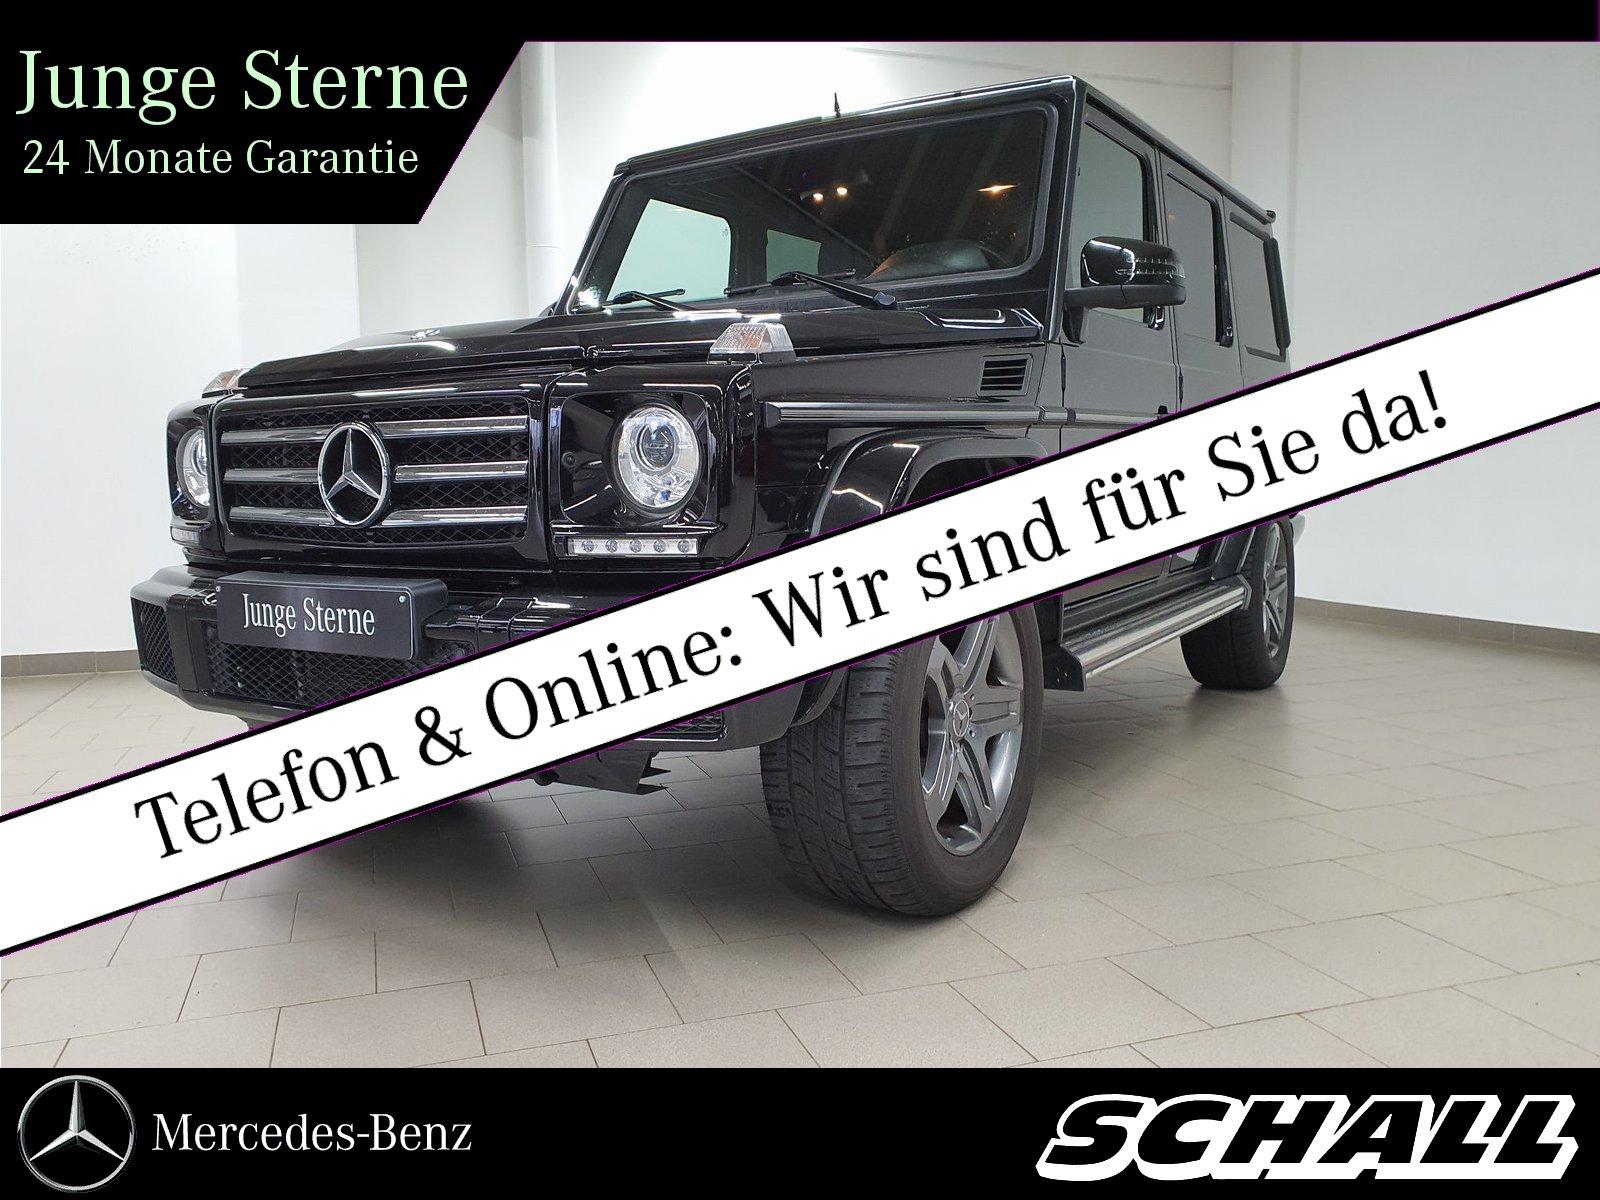 "Mercedes-Benz G 350 d AHK/19""AMG/DISTR/HARMAN/STANDHZ/KAM/XENO, Jahr 2015, diesel"